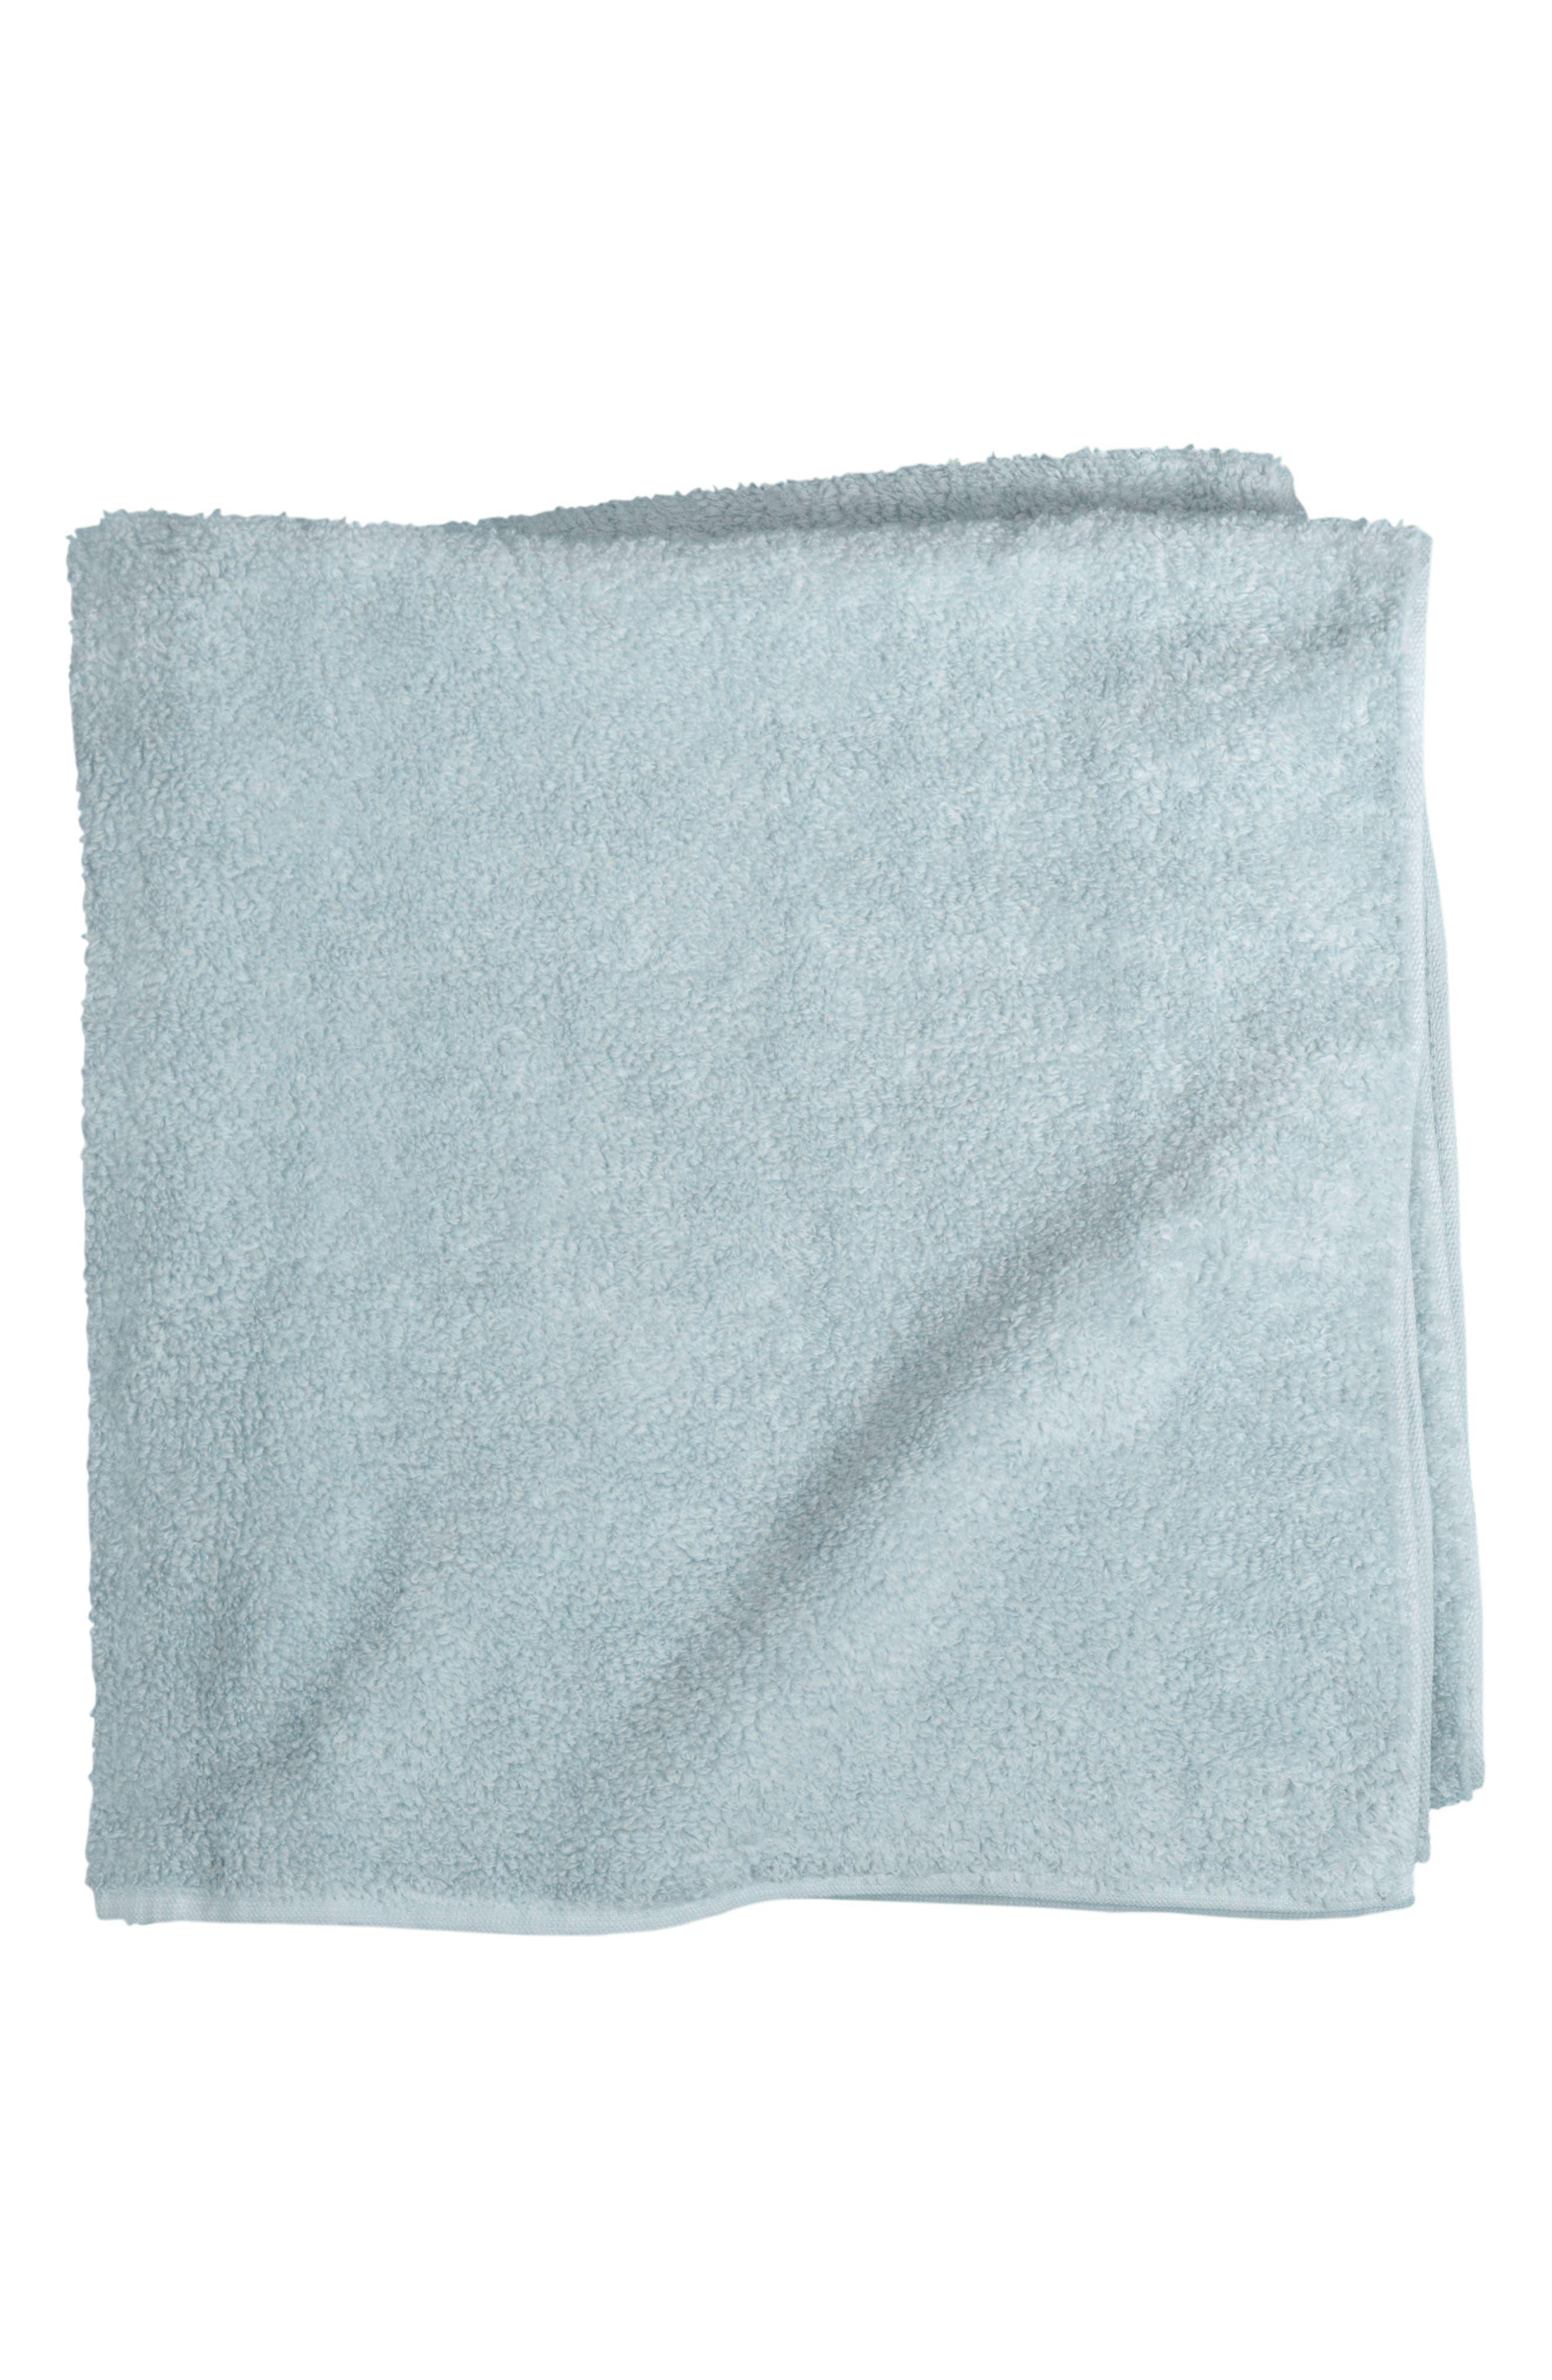 Main Image - Uchino Zero Twist Bath Towel